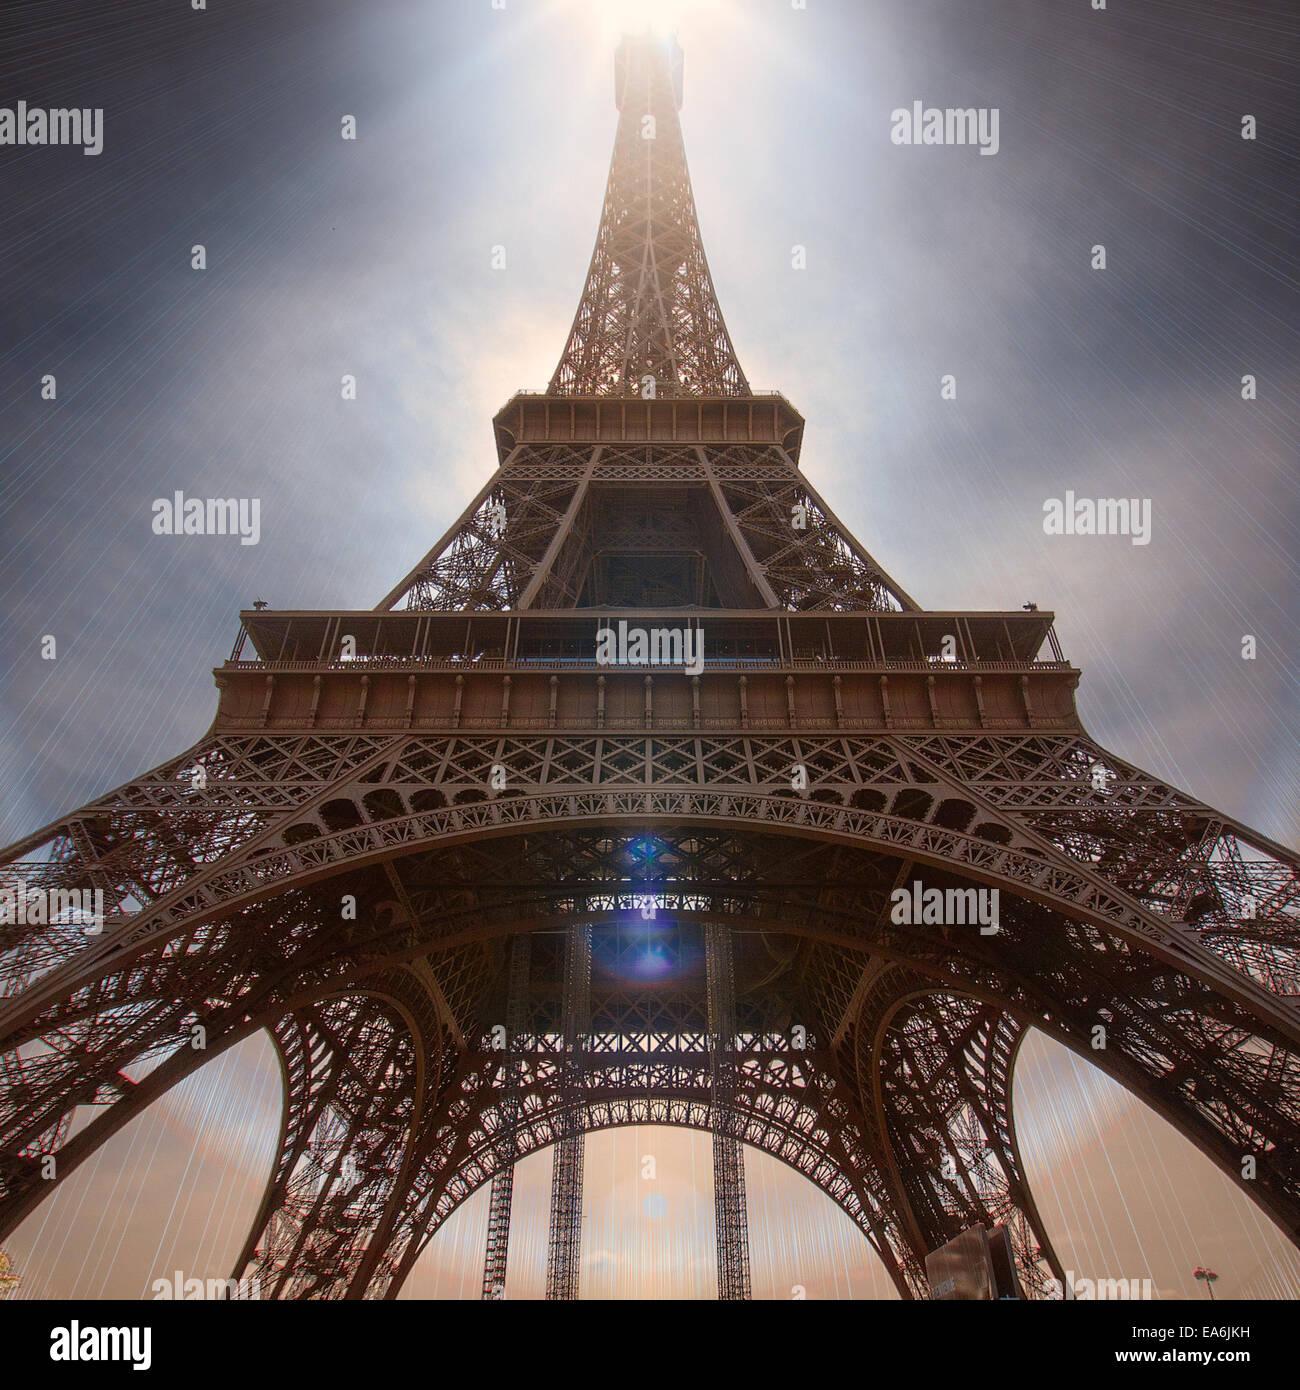 Frankreich, Paris, niedrigen Winkel Blick auf Eiffelturm Stockbild